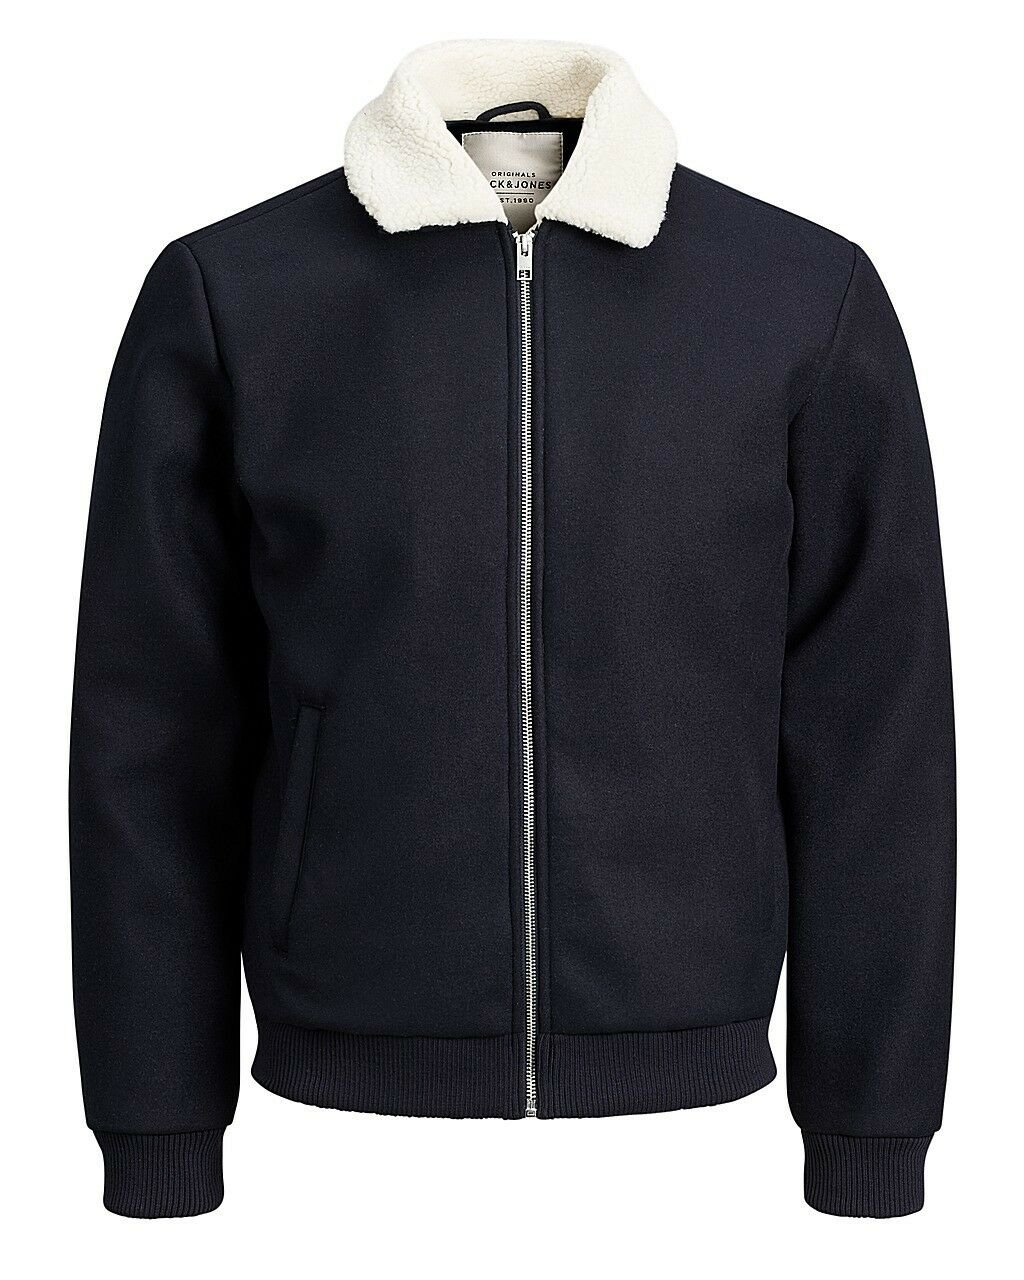 Jack /& Jones Originals Bomber Jacket Jorfreddy Mens Wool Blend Borg Collar Coat